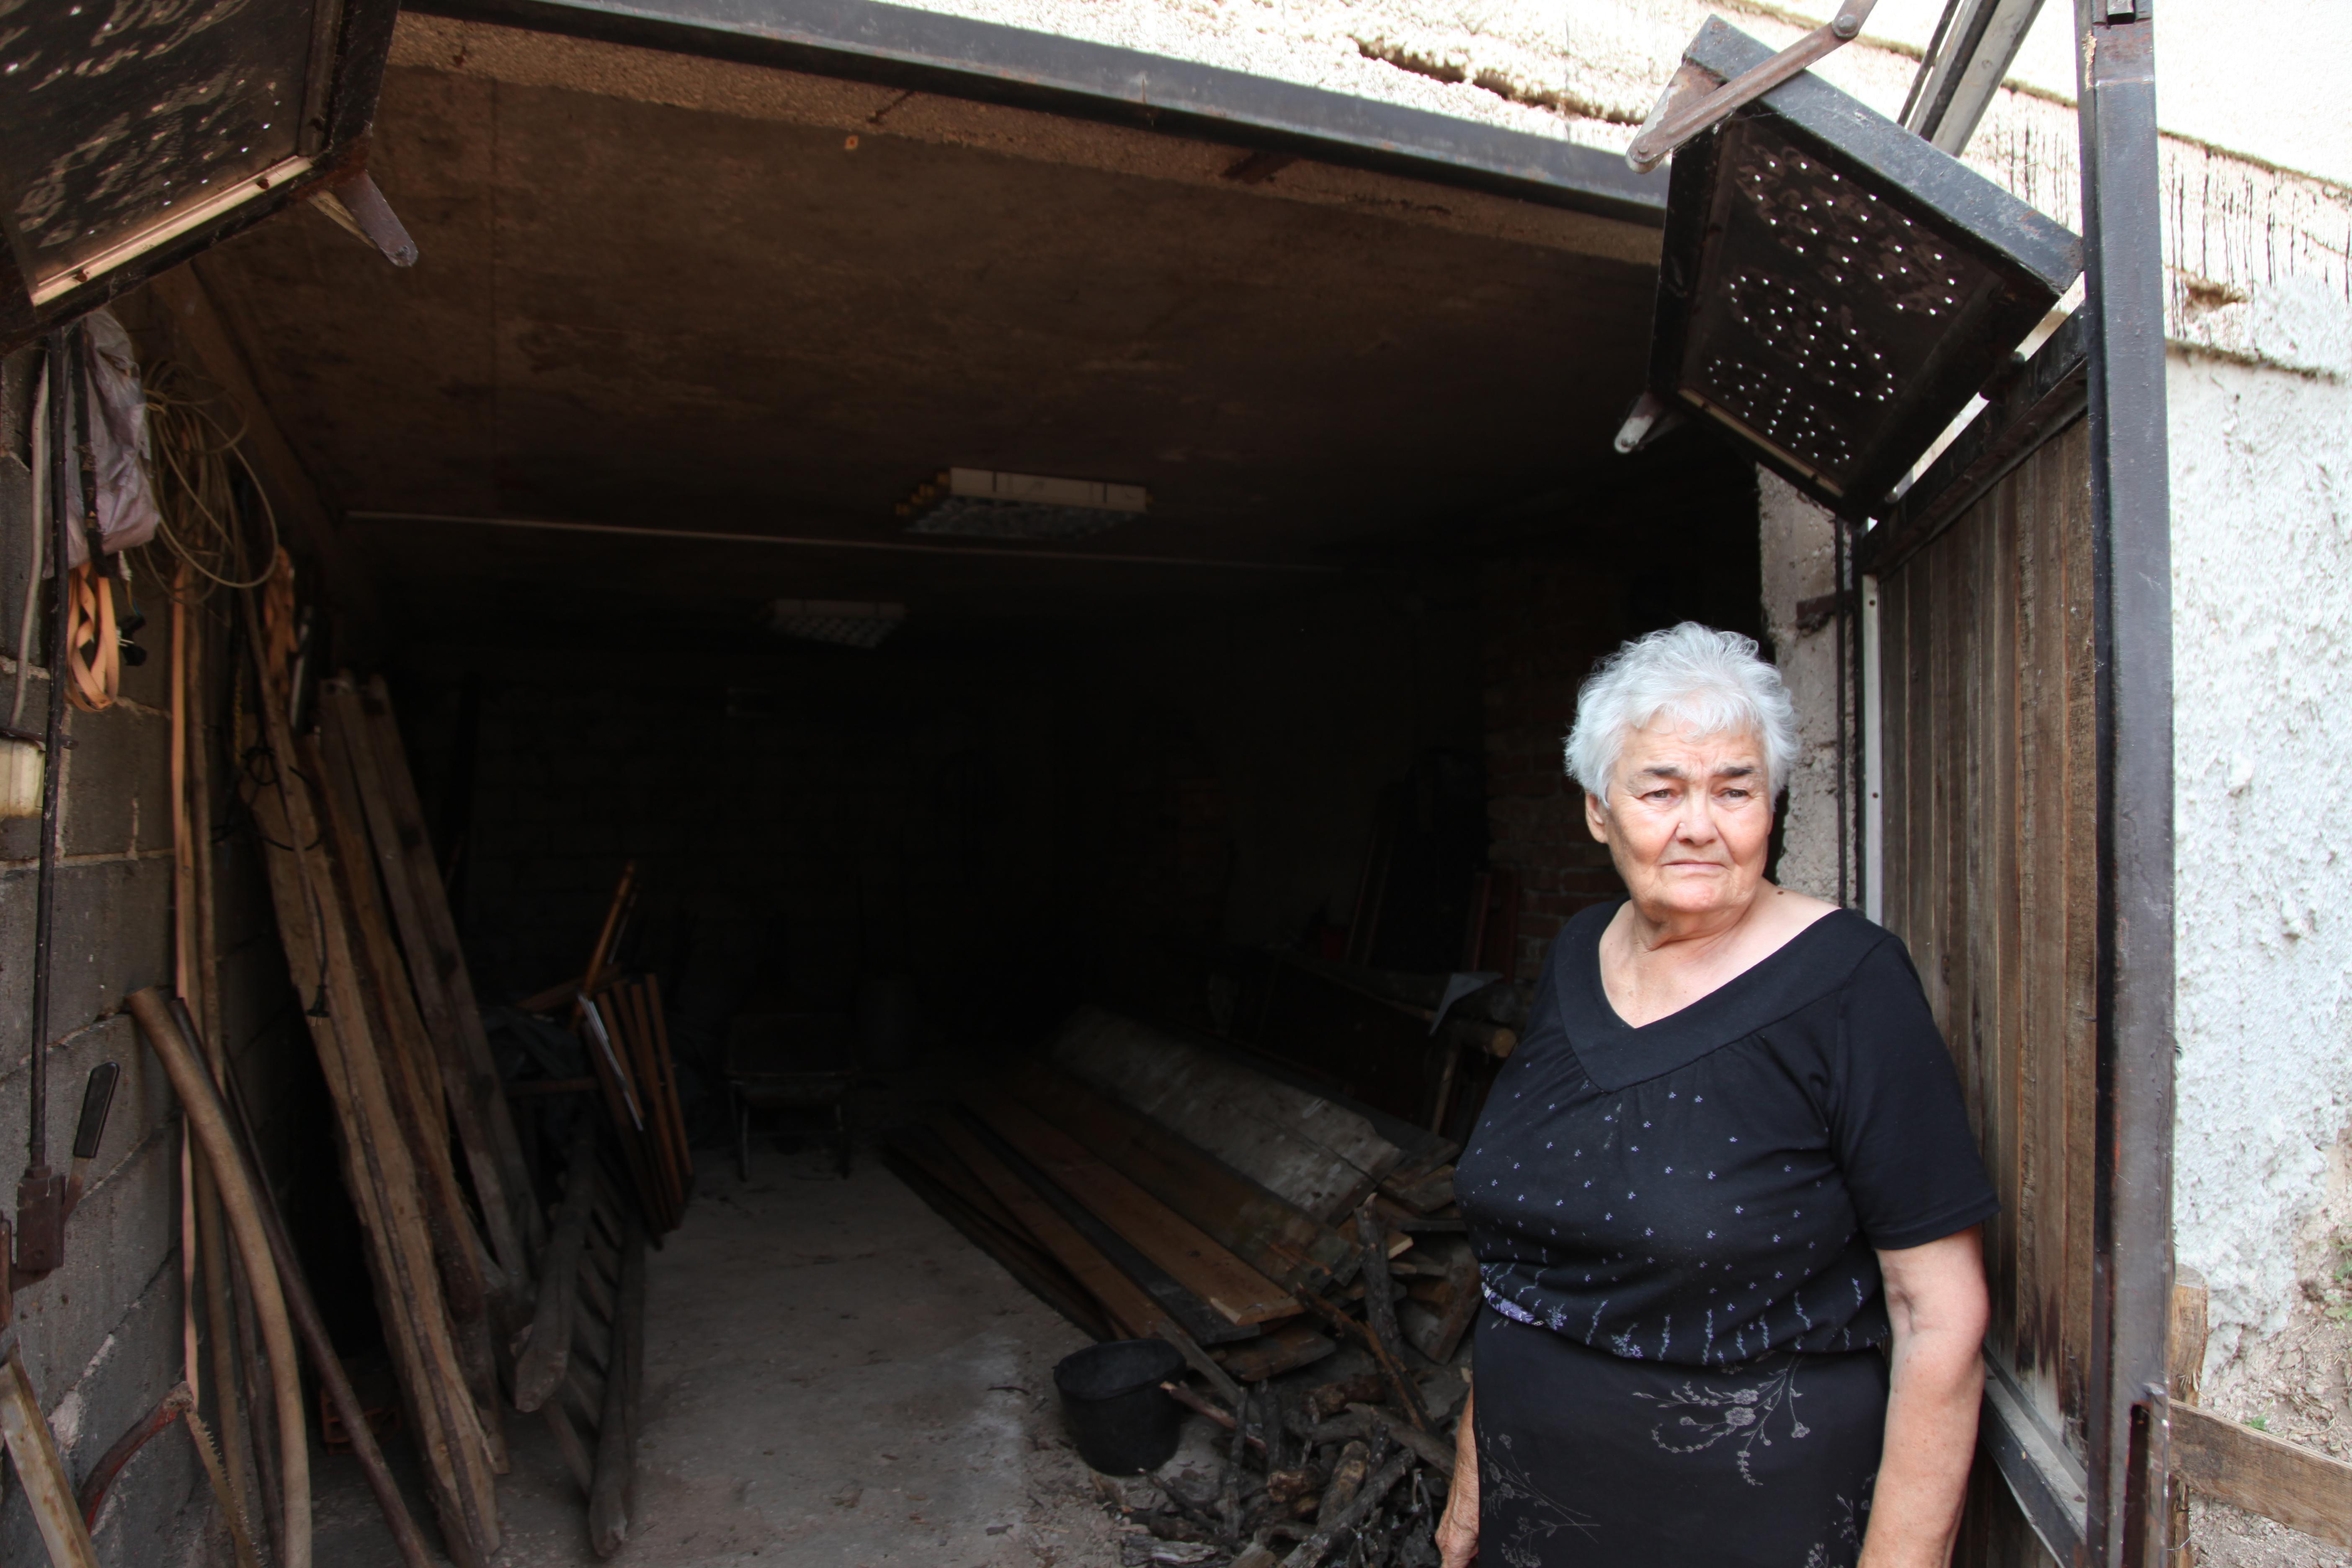 Kata Salipur, Salipur's grandmother, standing next to her basement.